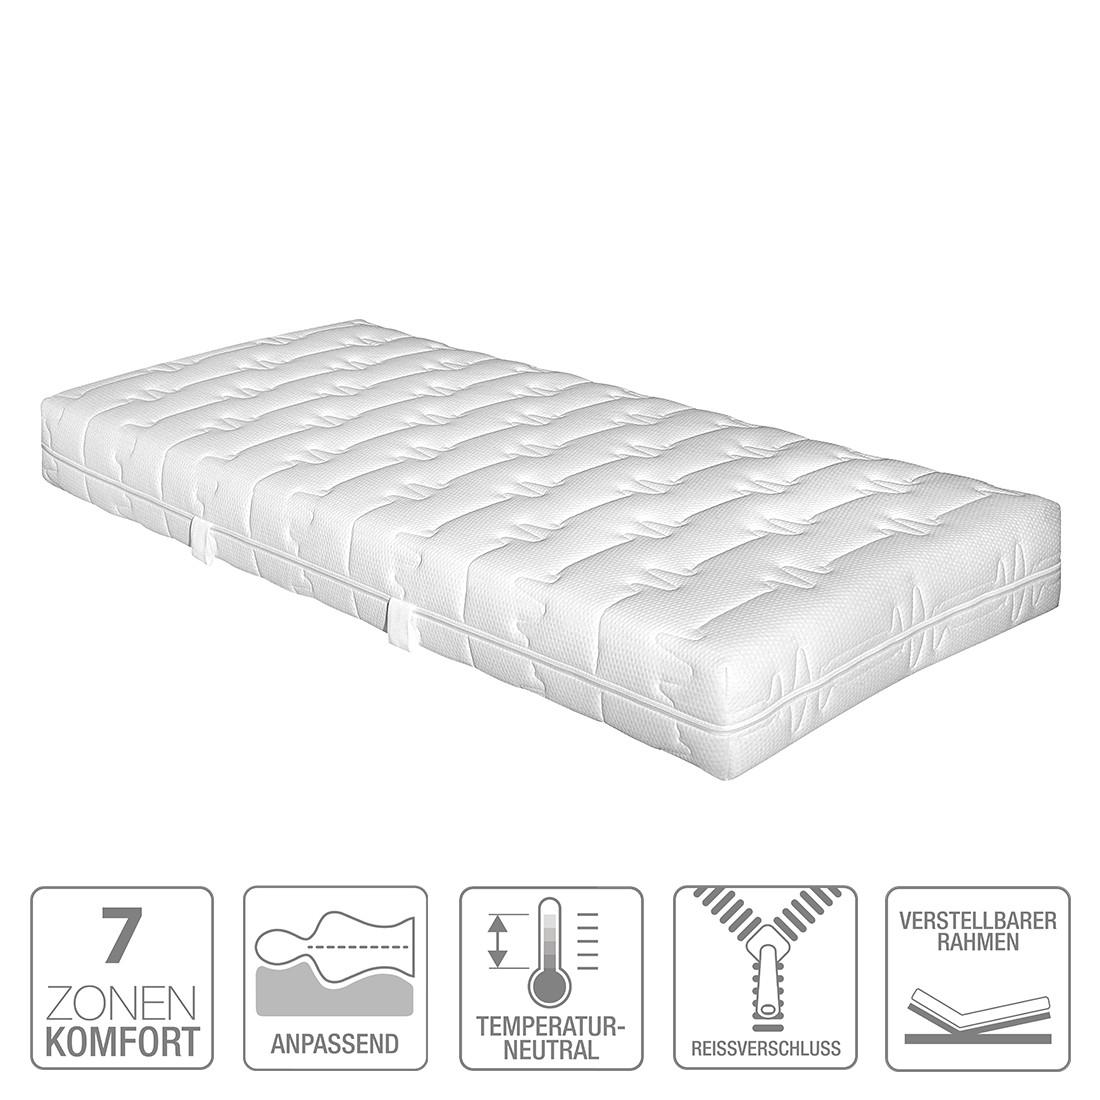 7 zonen hyperflex kaltschaummatratze clean pro 100 x 200cm h3 ab 80 kg hukla online bestellen. Black Bedroom Furniture Sets. Home Design Ideas